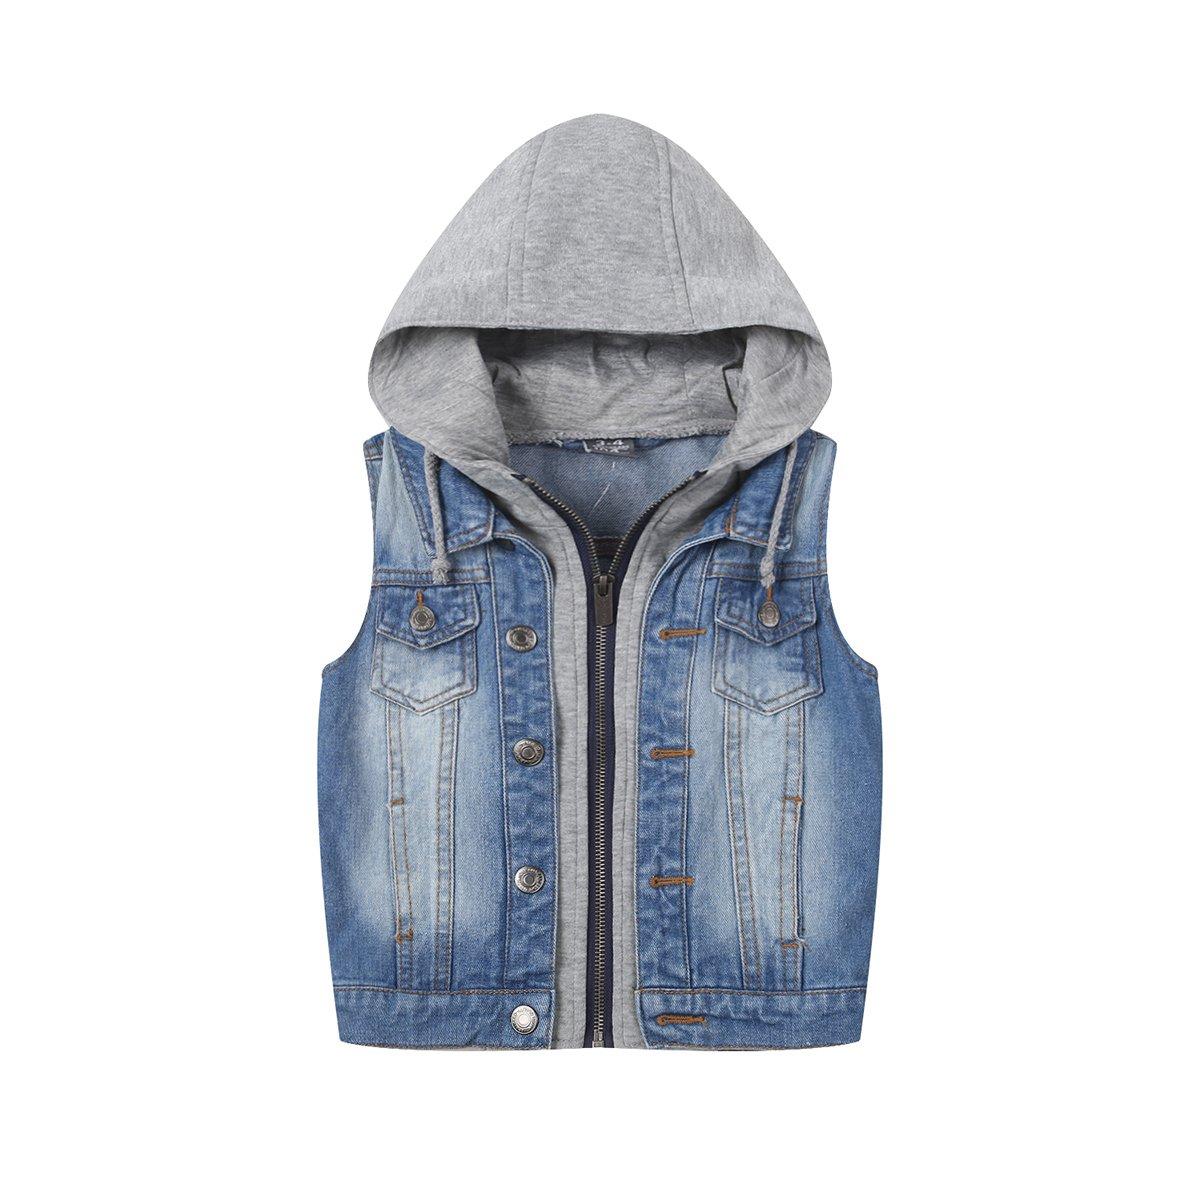 SUSIELADY Kids Fashion Hoodie Button Jean Jacket Baby Boys Hooded Denim Vest Tops Tank Waistcoat Zip Printed Hood 7T/8T